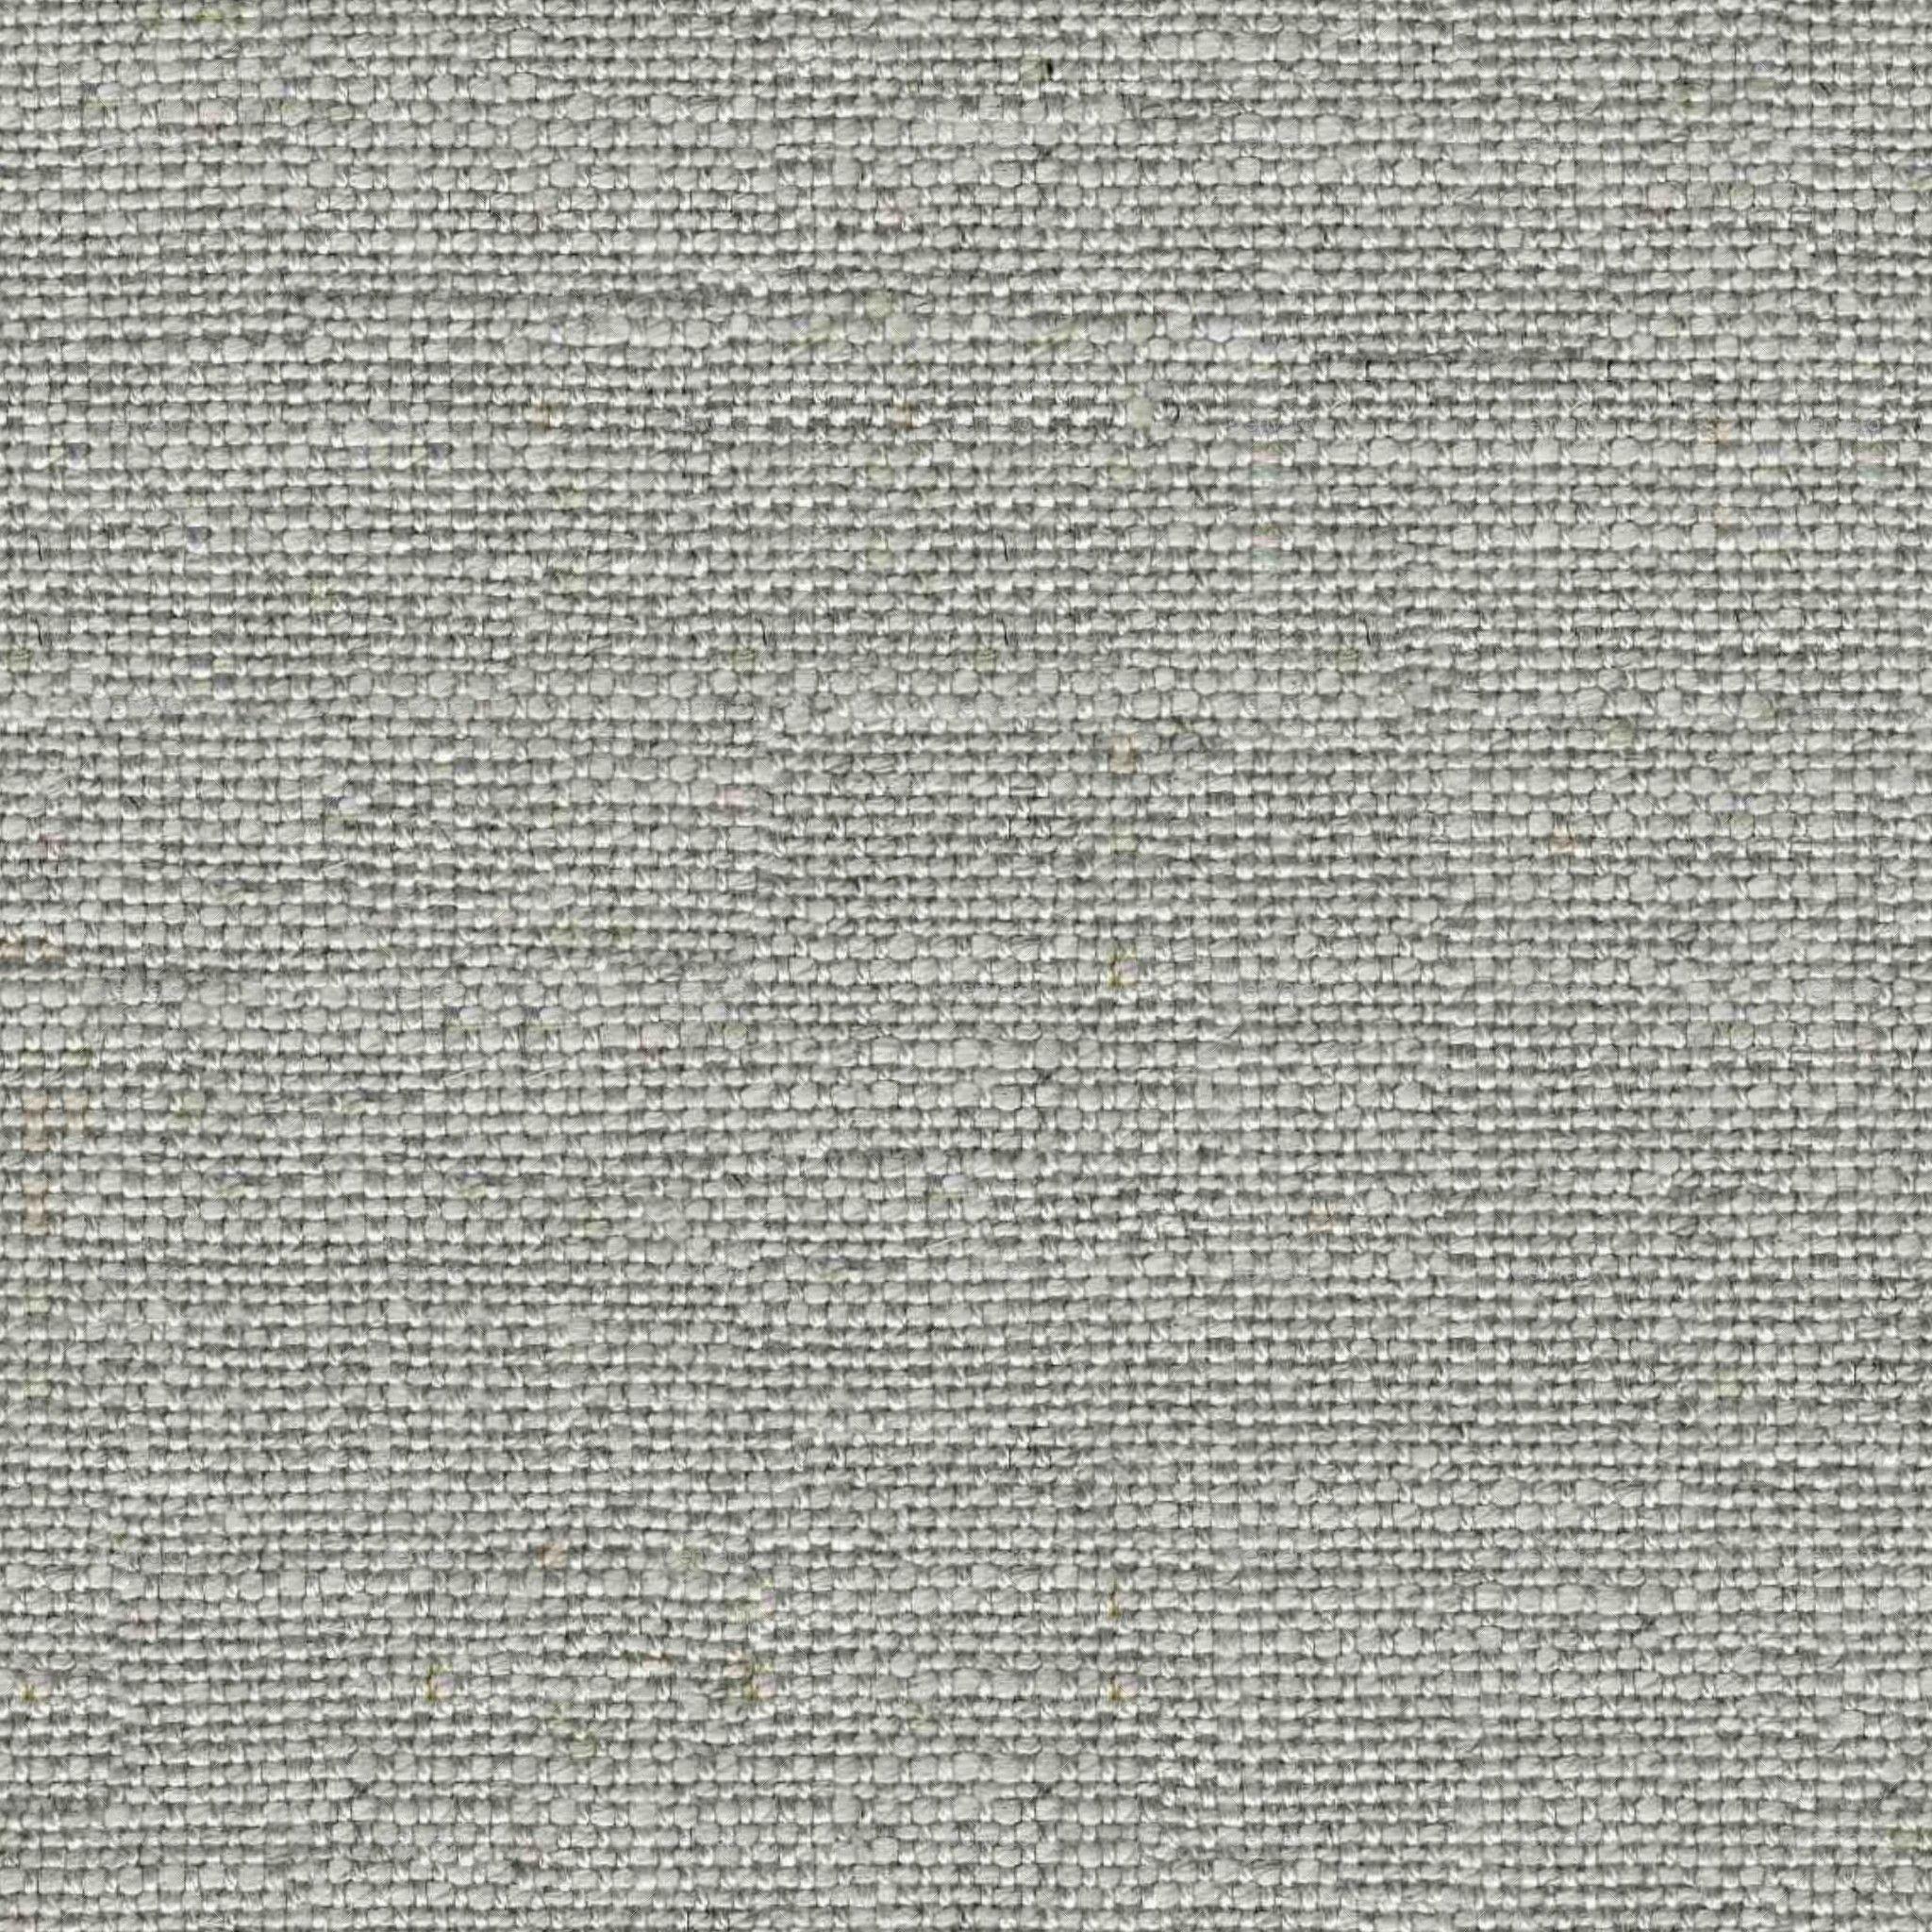 Fabric Seamless Texture Set Volume 2 Fabric Textures Seamless Textures Dobby Fabric